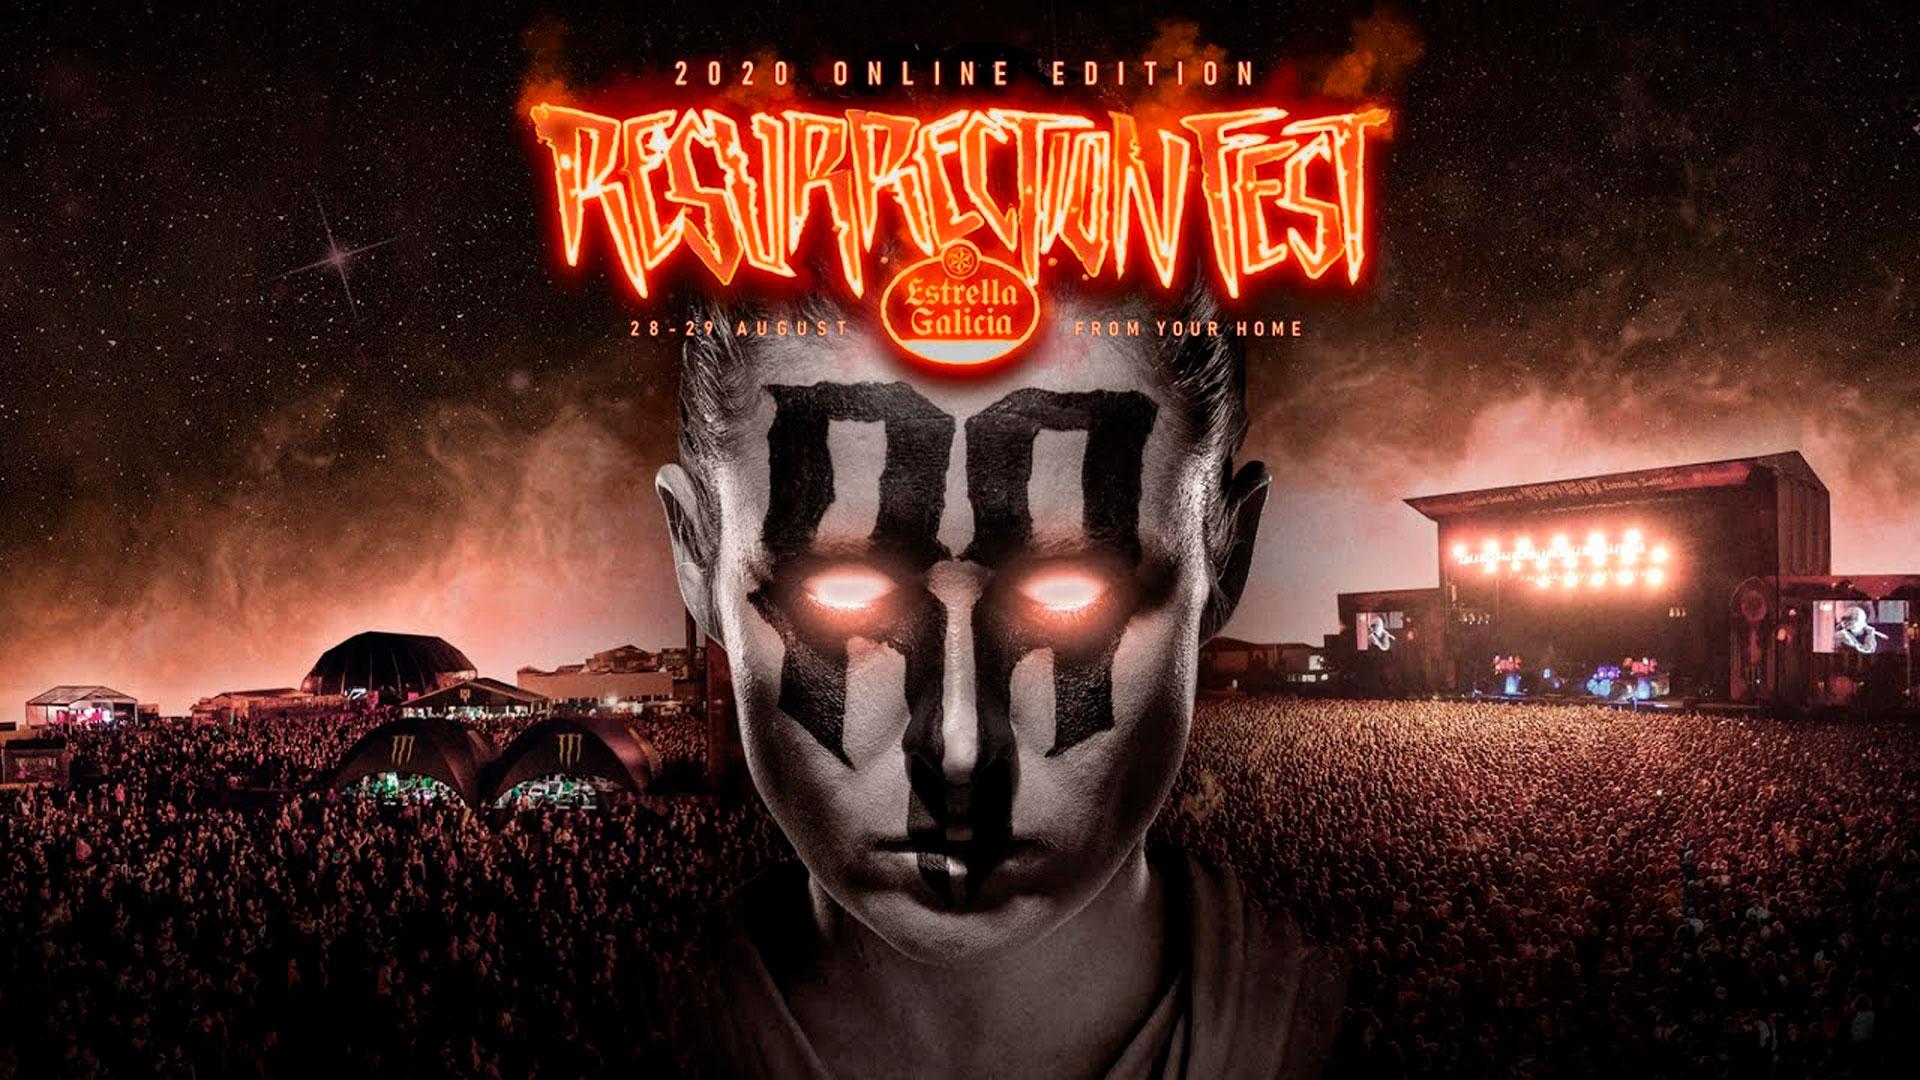 Resurrection Fest: Online Edition